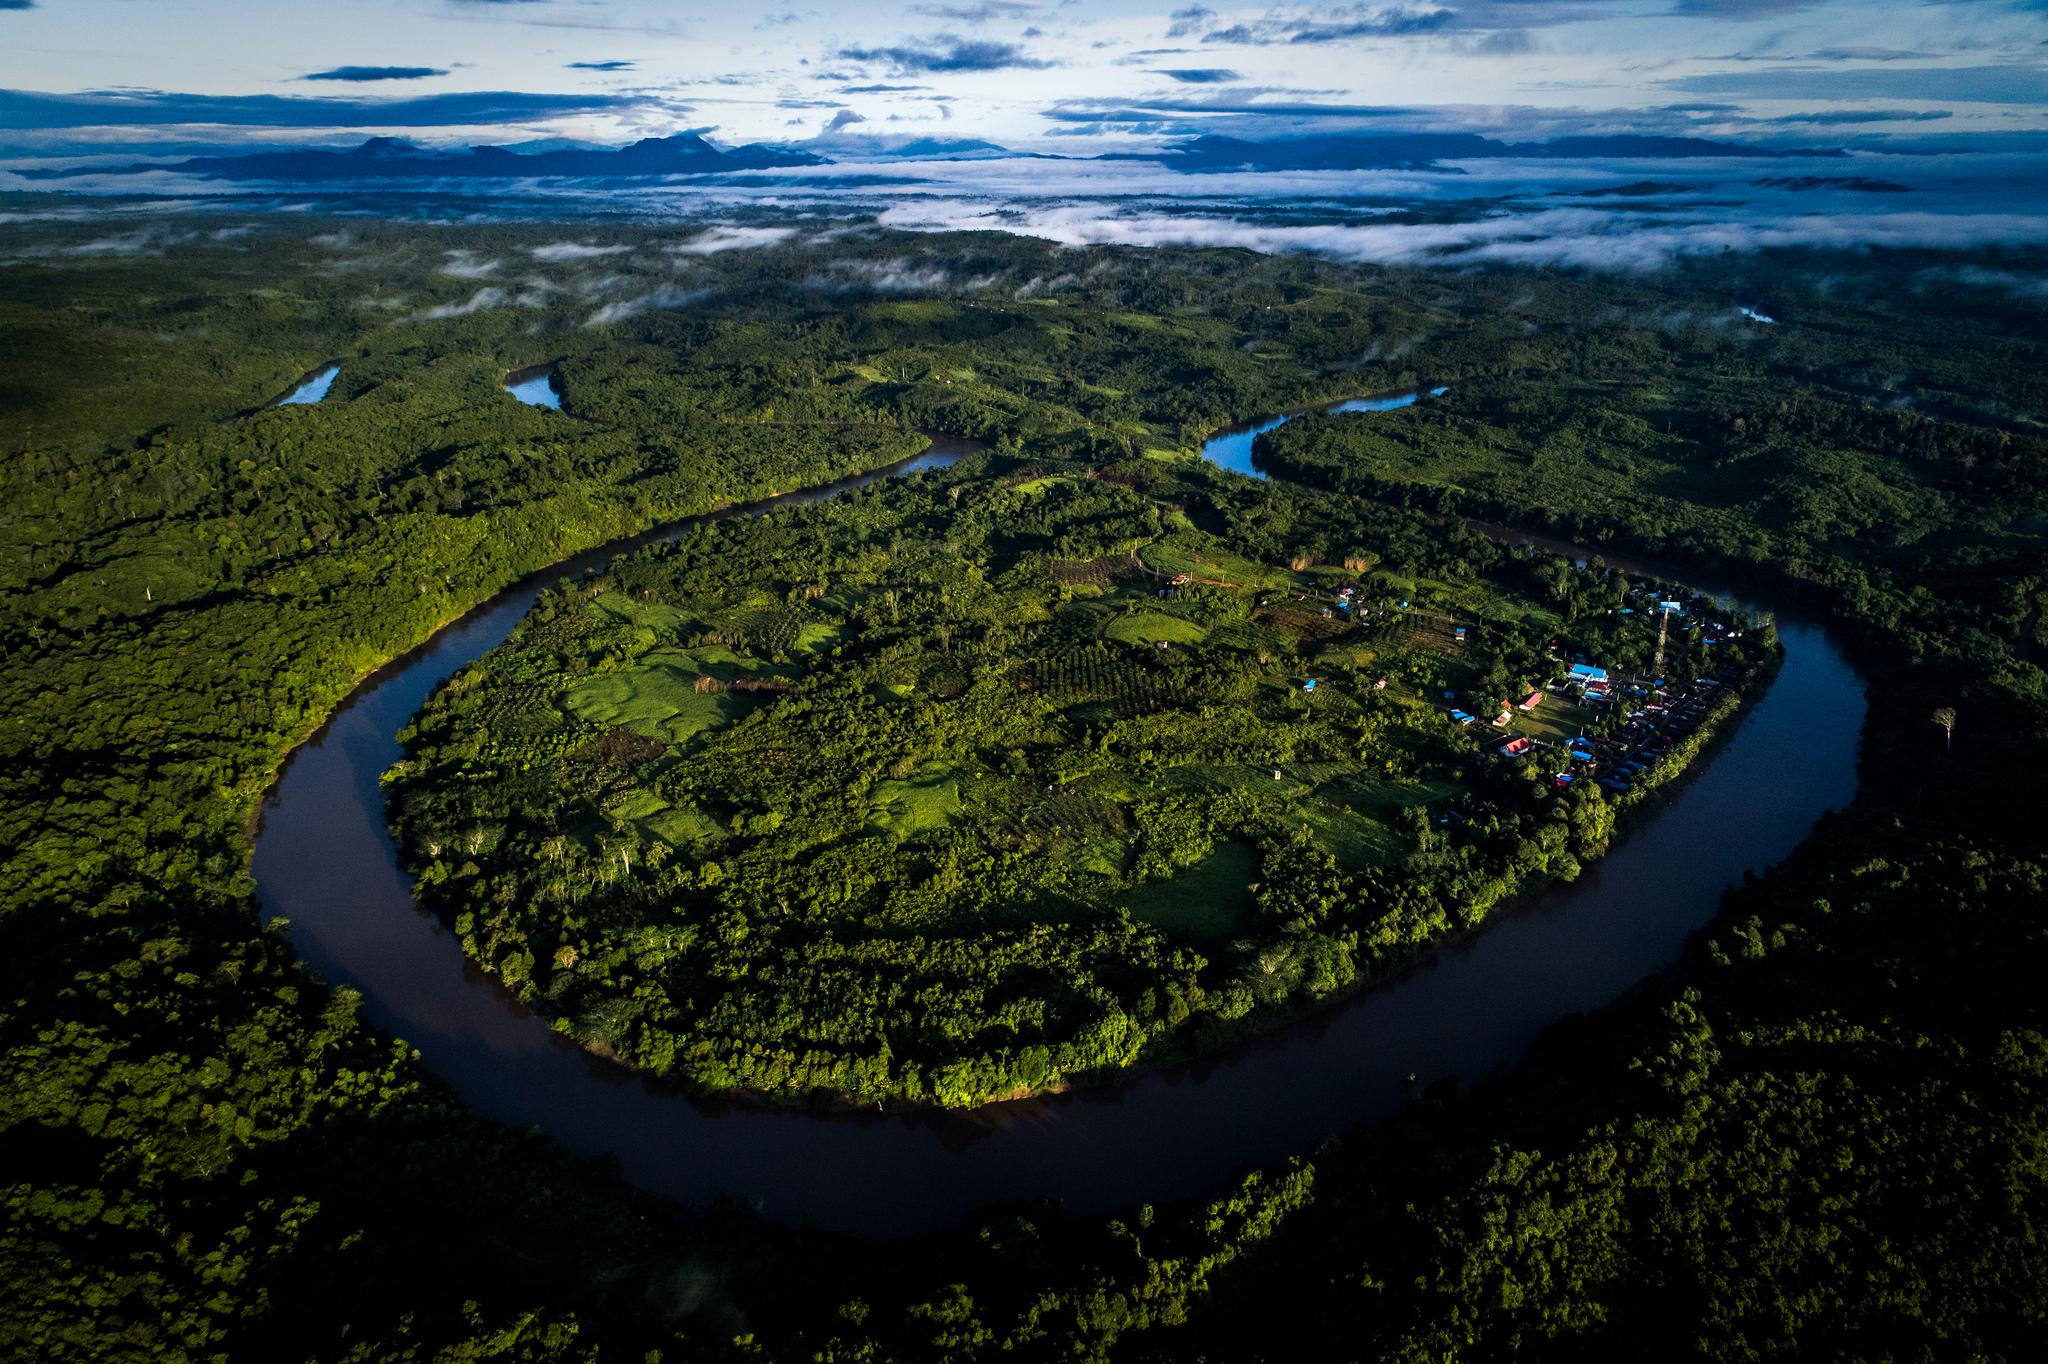 Borneo's carbon sink